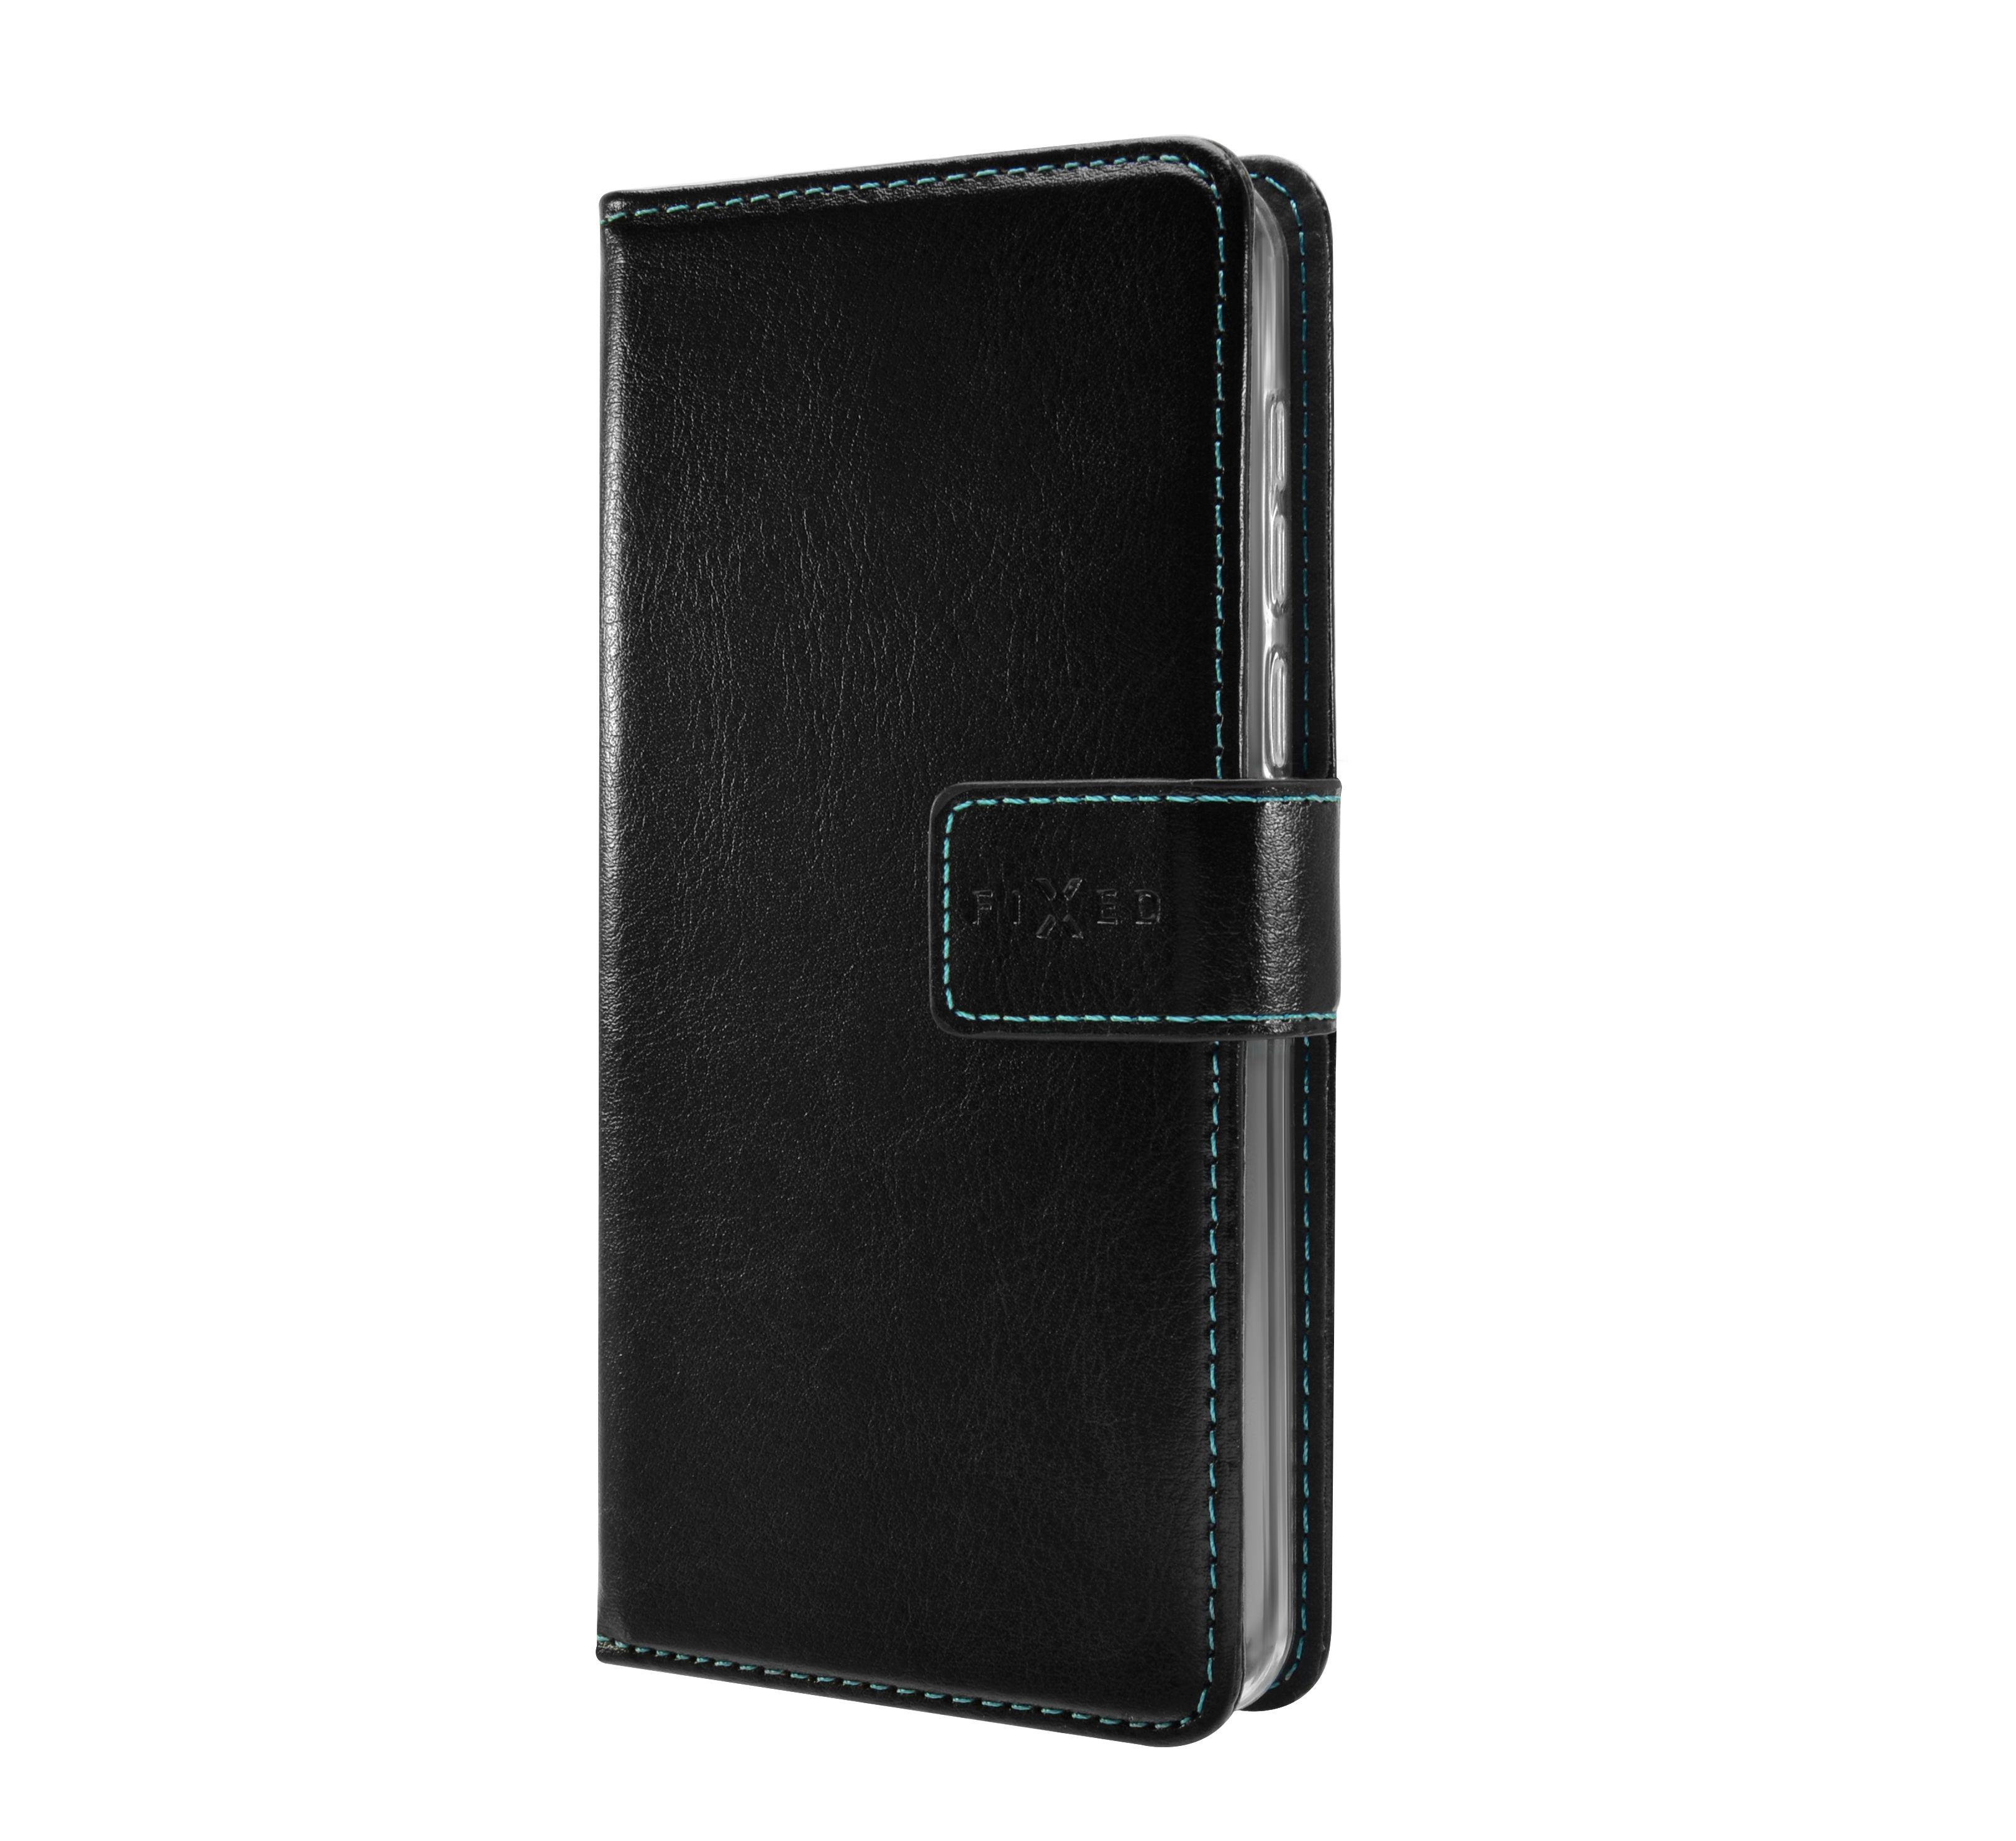 FIXED Opus flipové pouzdro pro Huawei Y7 Prime (2018), black